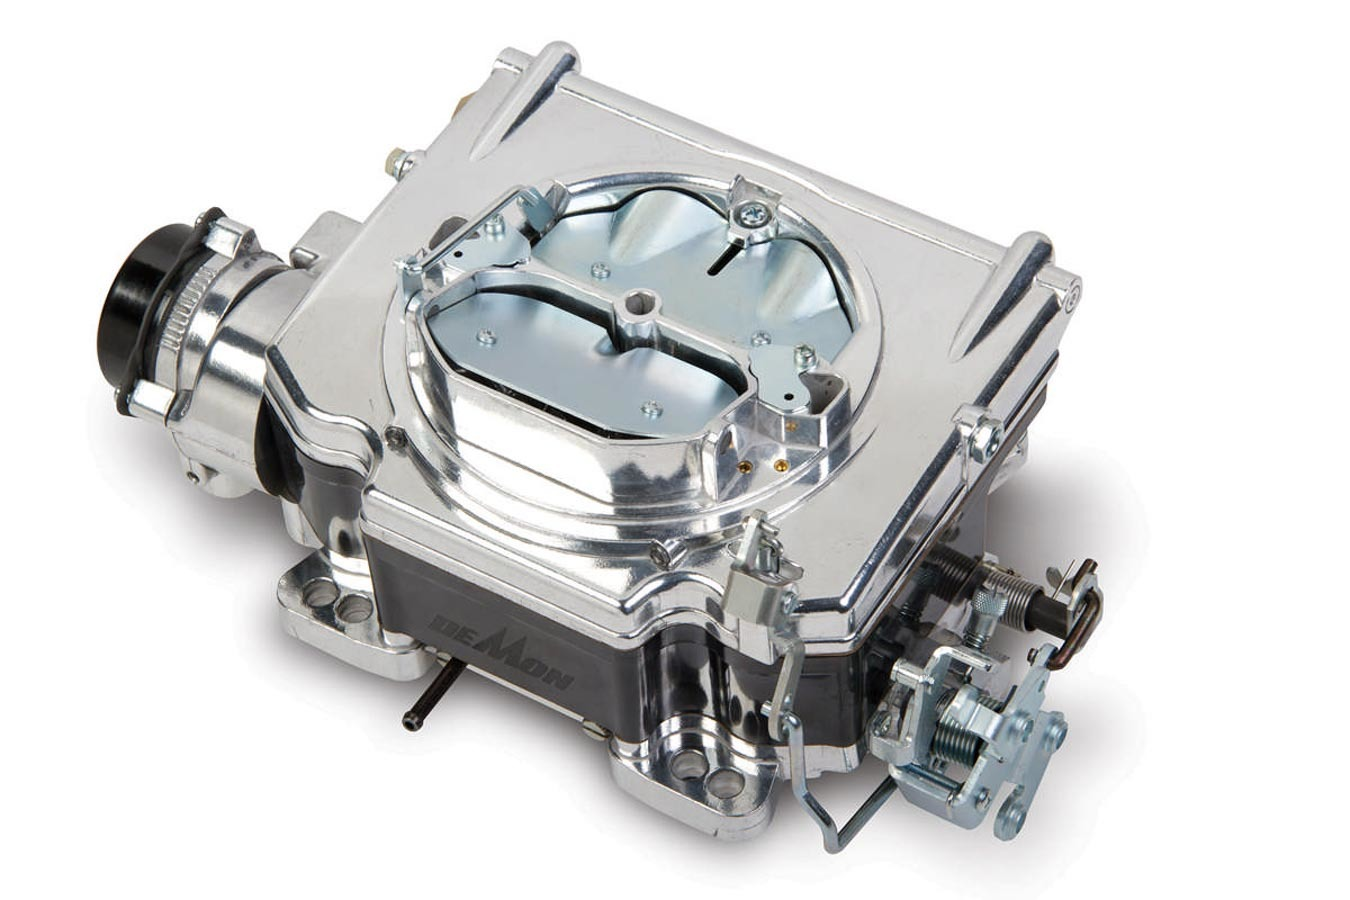 Demon Carburetion 1901 Carburetor, Street Demon, 4-Barrel, 625 CFM, Spread / Square Bore, Electric Choke, Vacuum Secondary, Single Inlet, Black / Burnished, Each